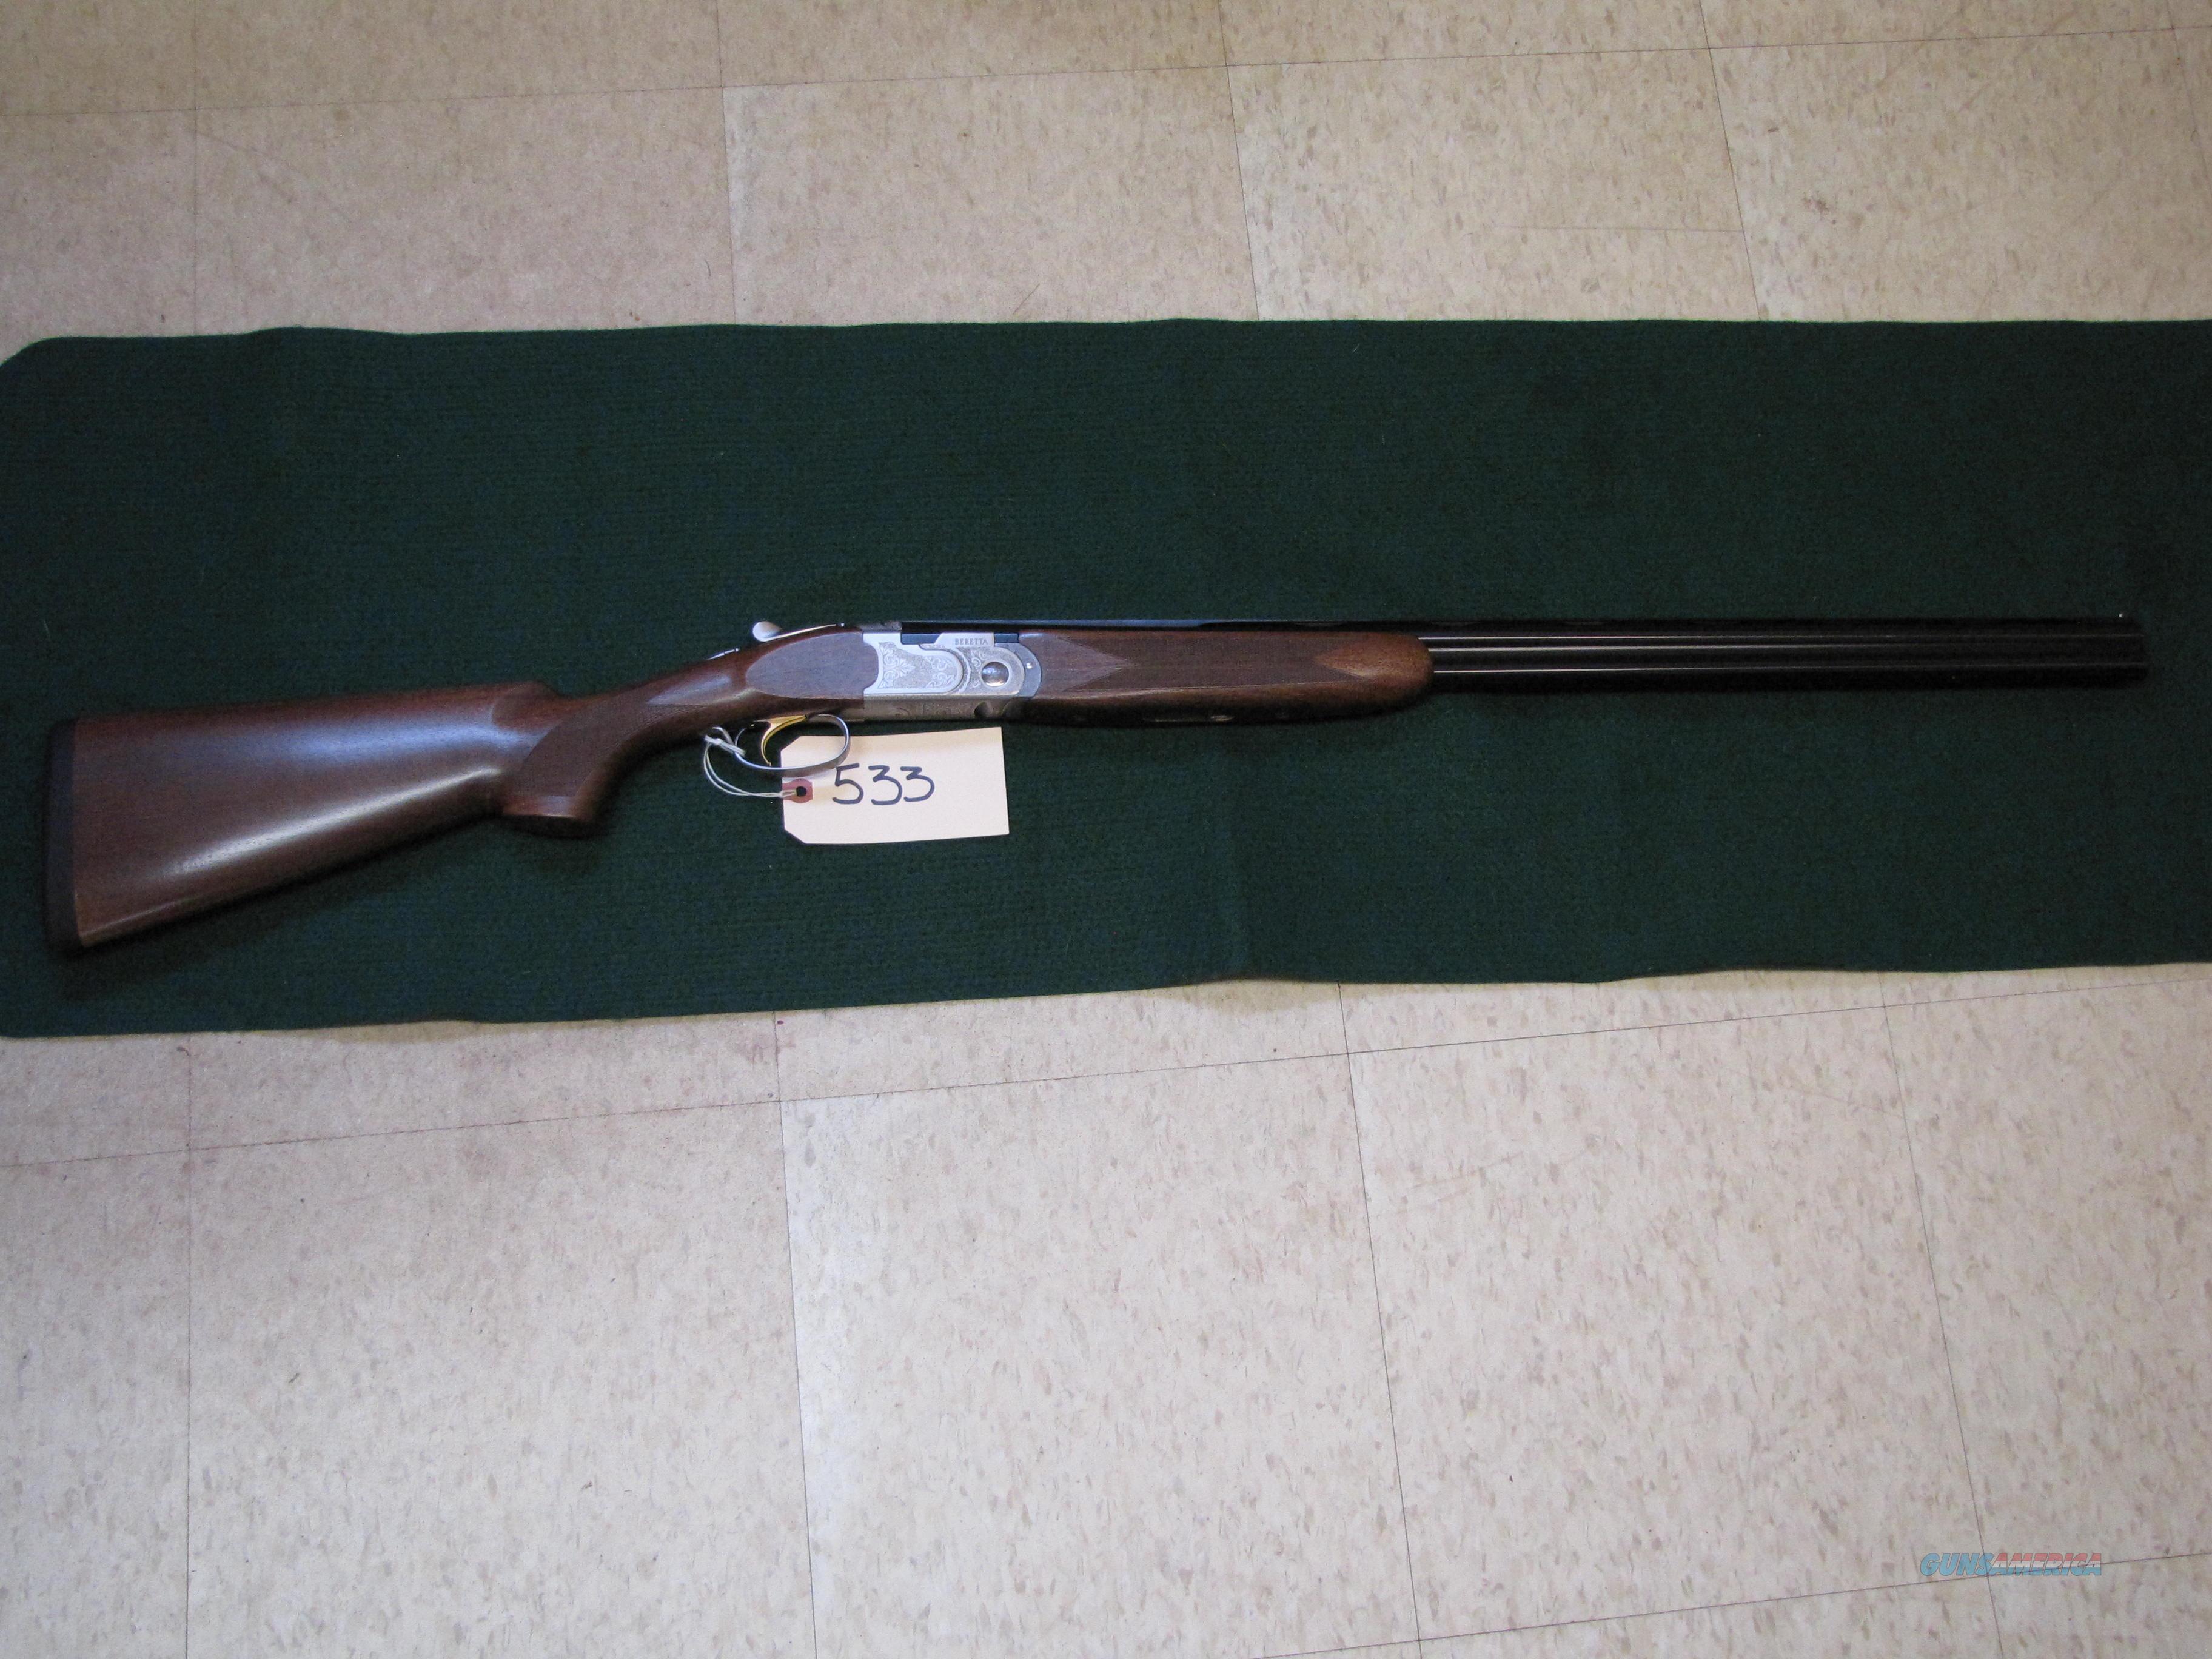 NEW Beretta Silver Pigeon 1, 28 gauge 28 inch  Guns > Shotguns > Beretta Shotguns > O/U > Hunting